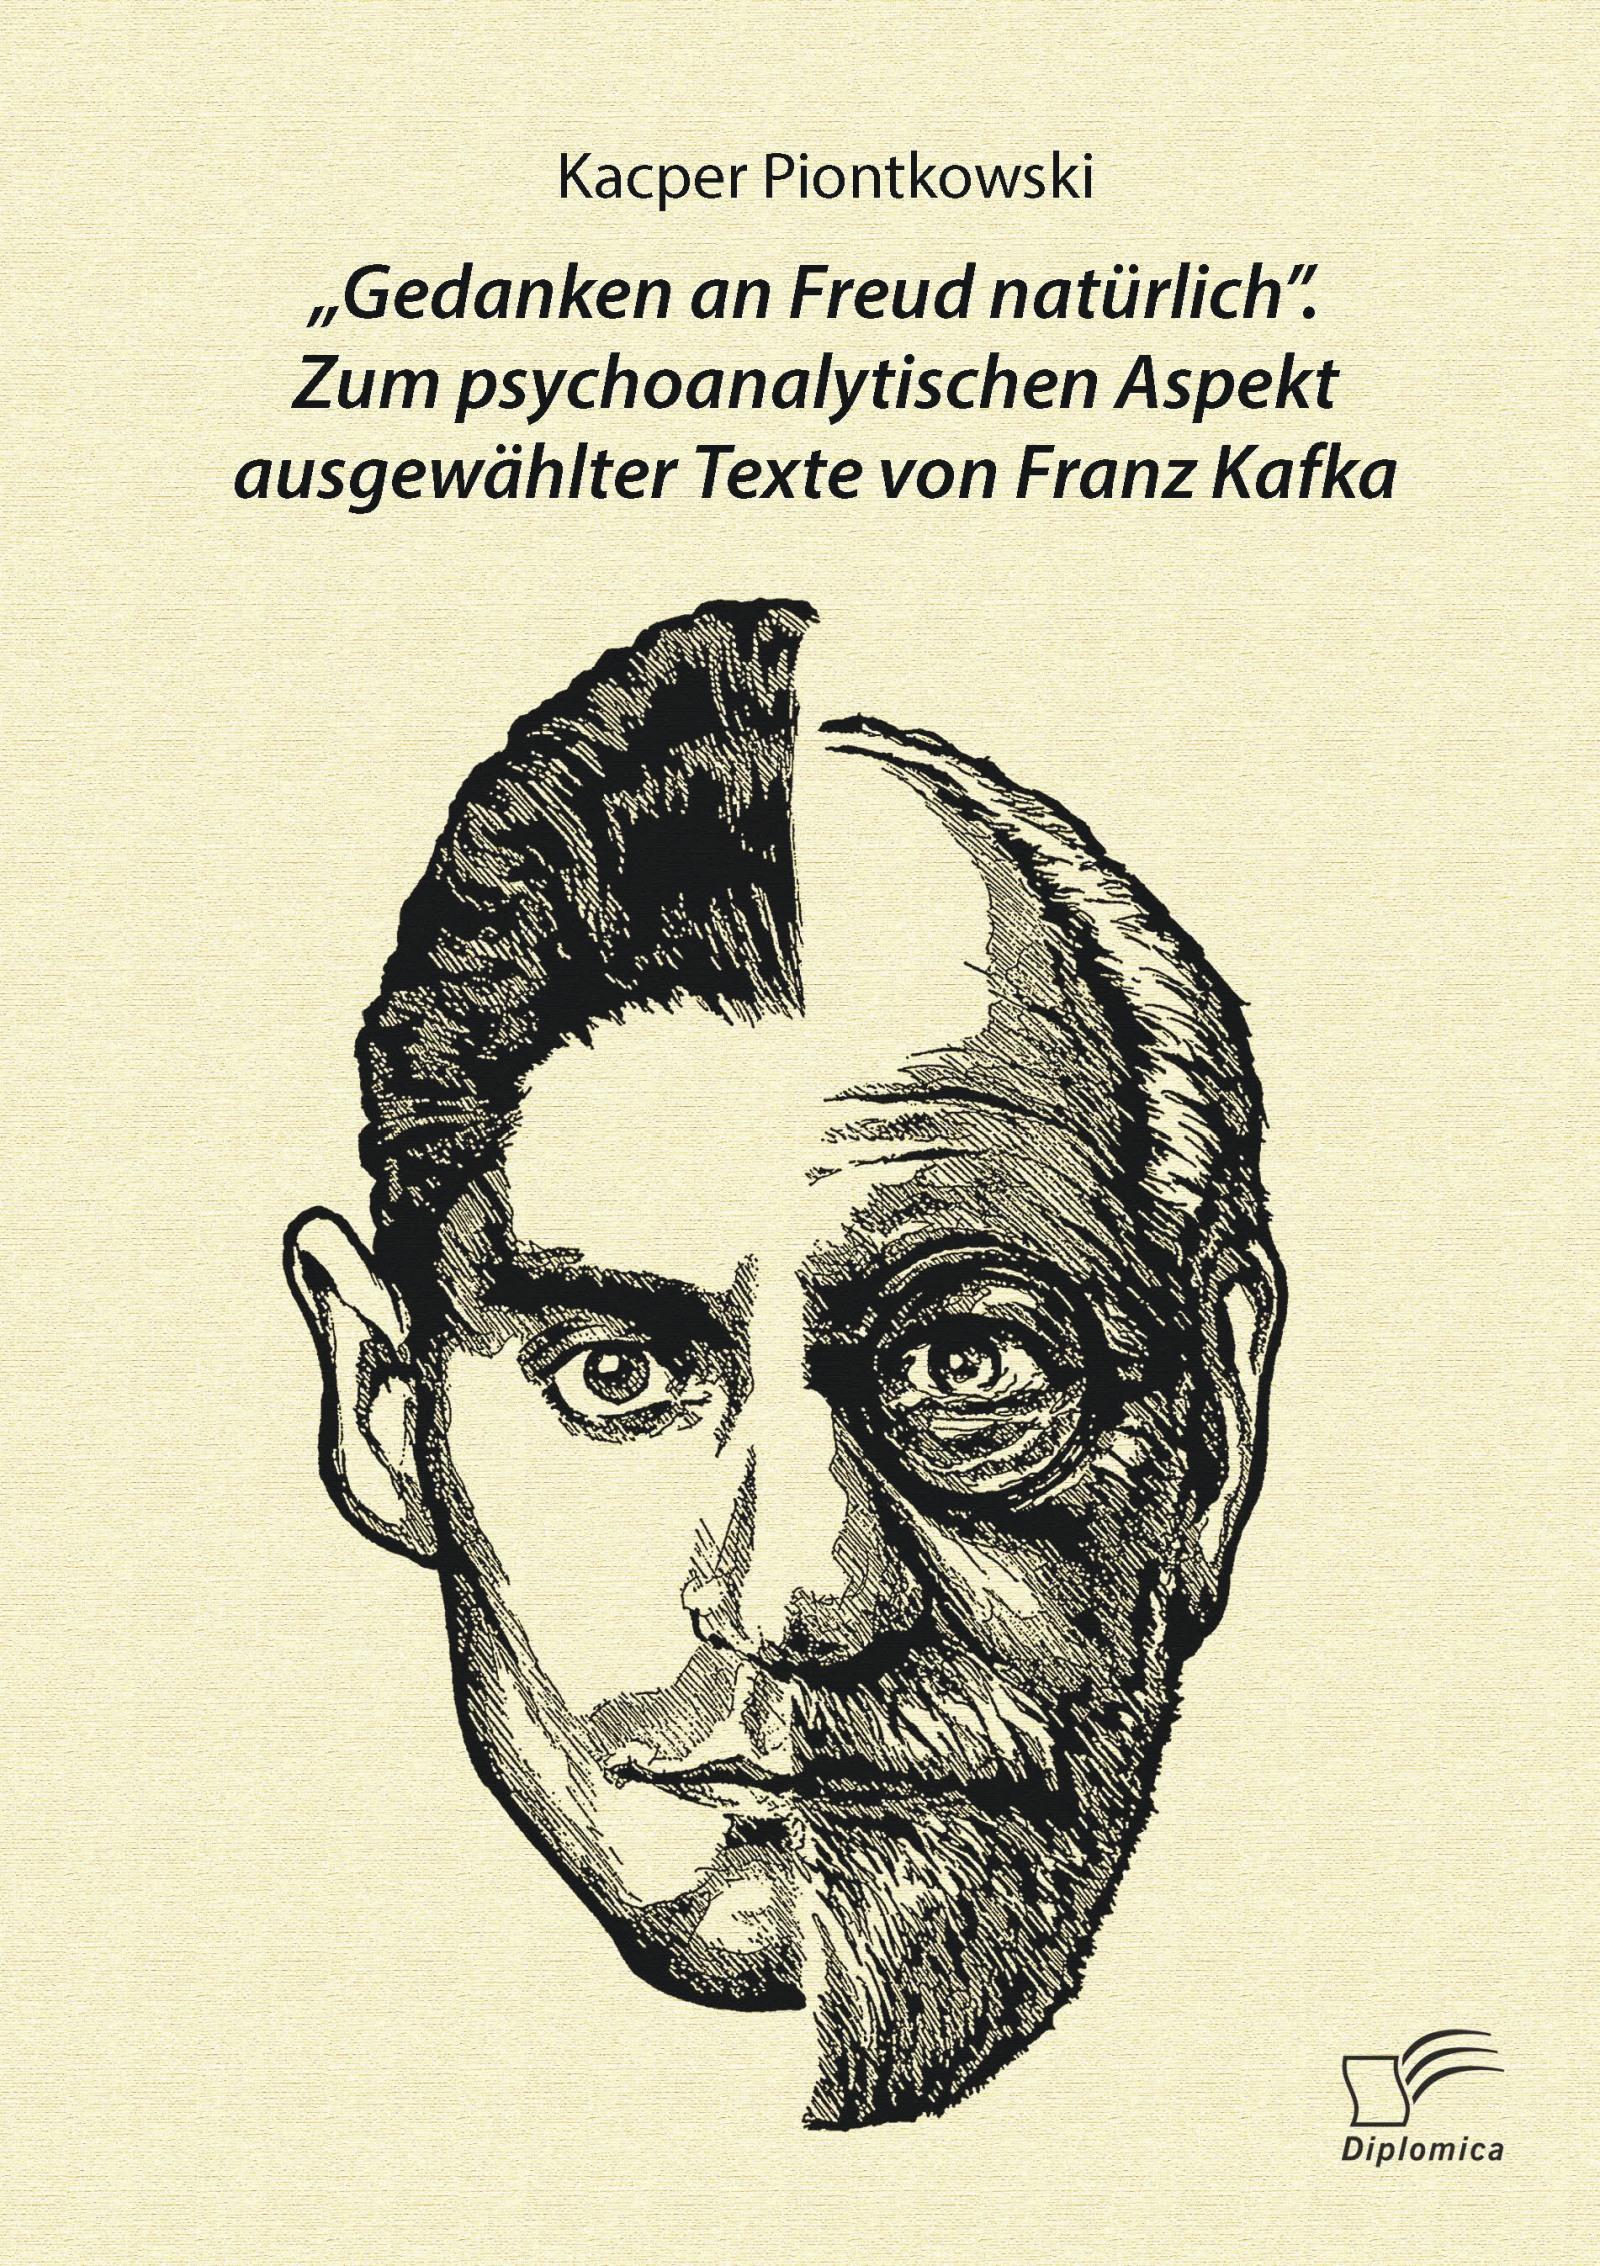 bild vergrern - Franz Kafka Lebenslauf